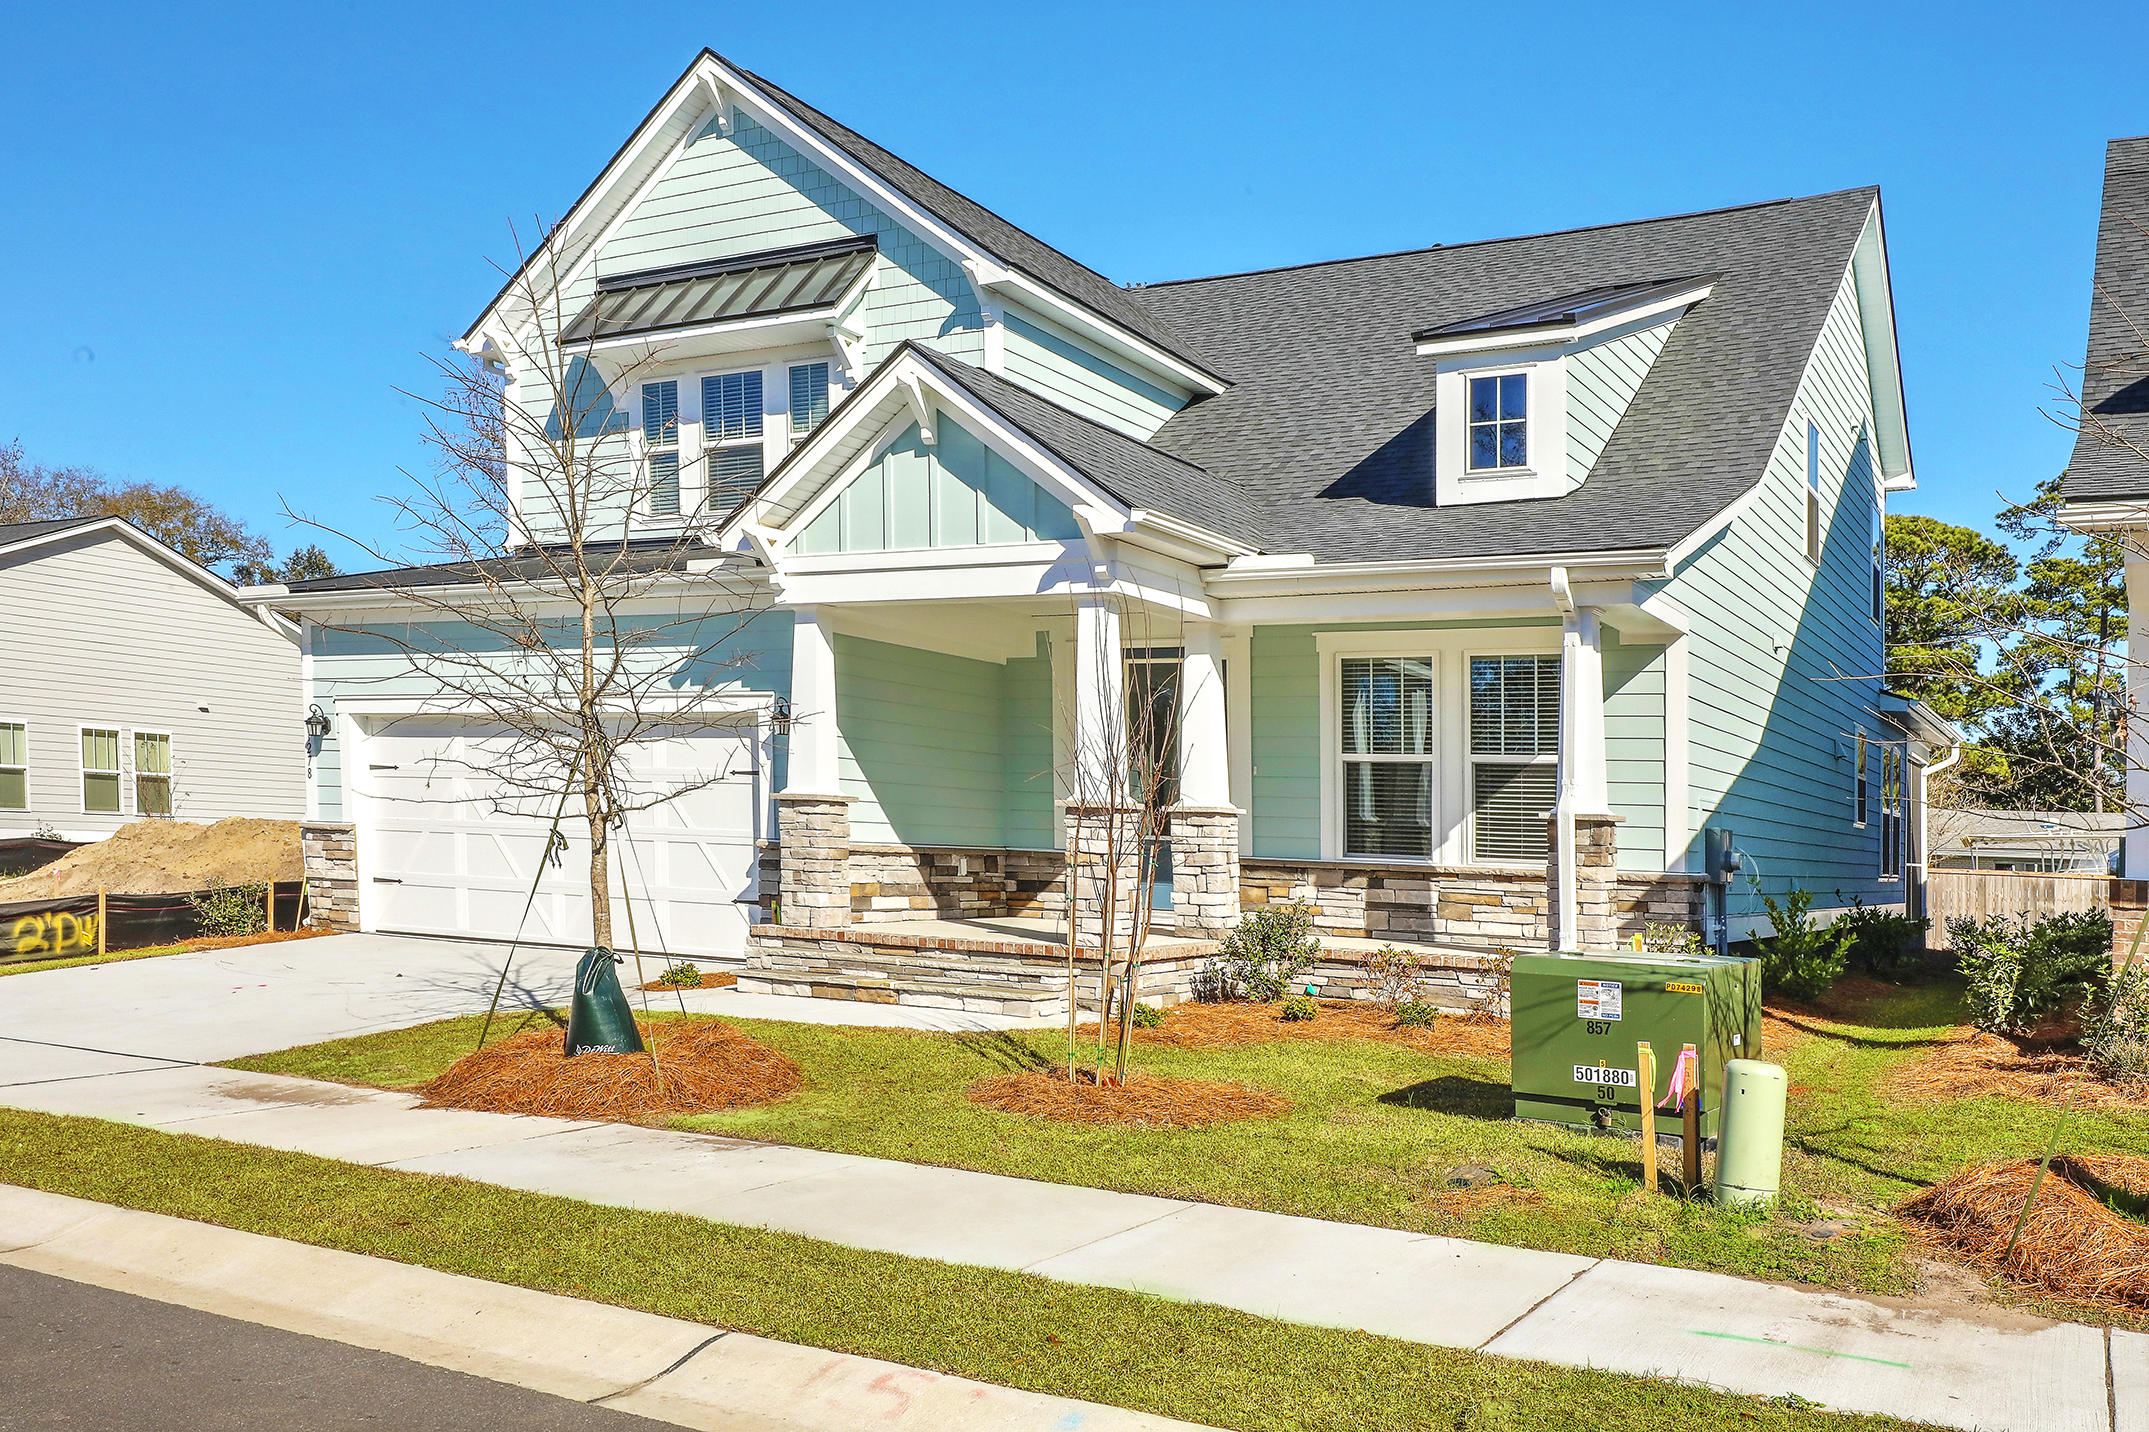 Bentley Park Homes For Sale - 1273 Gannett, Mount Pleasant, SC - 0